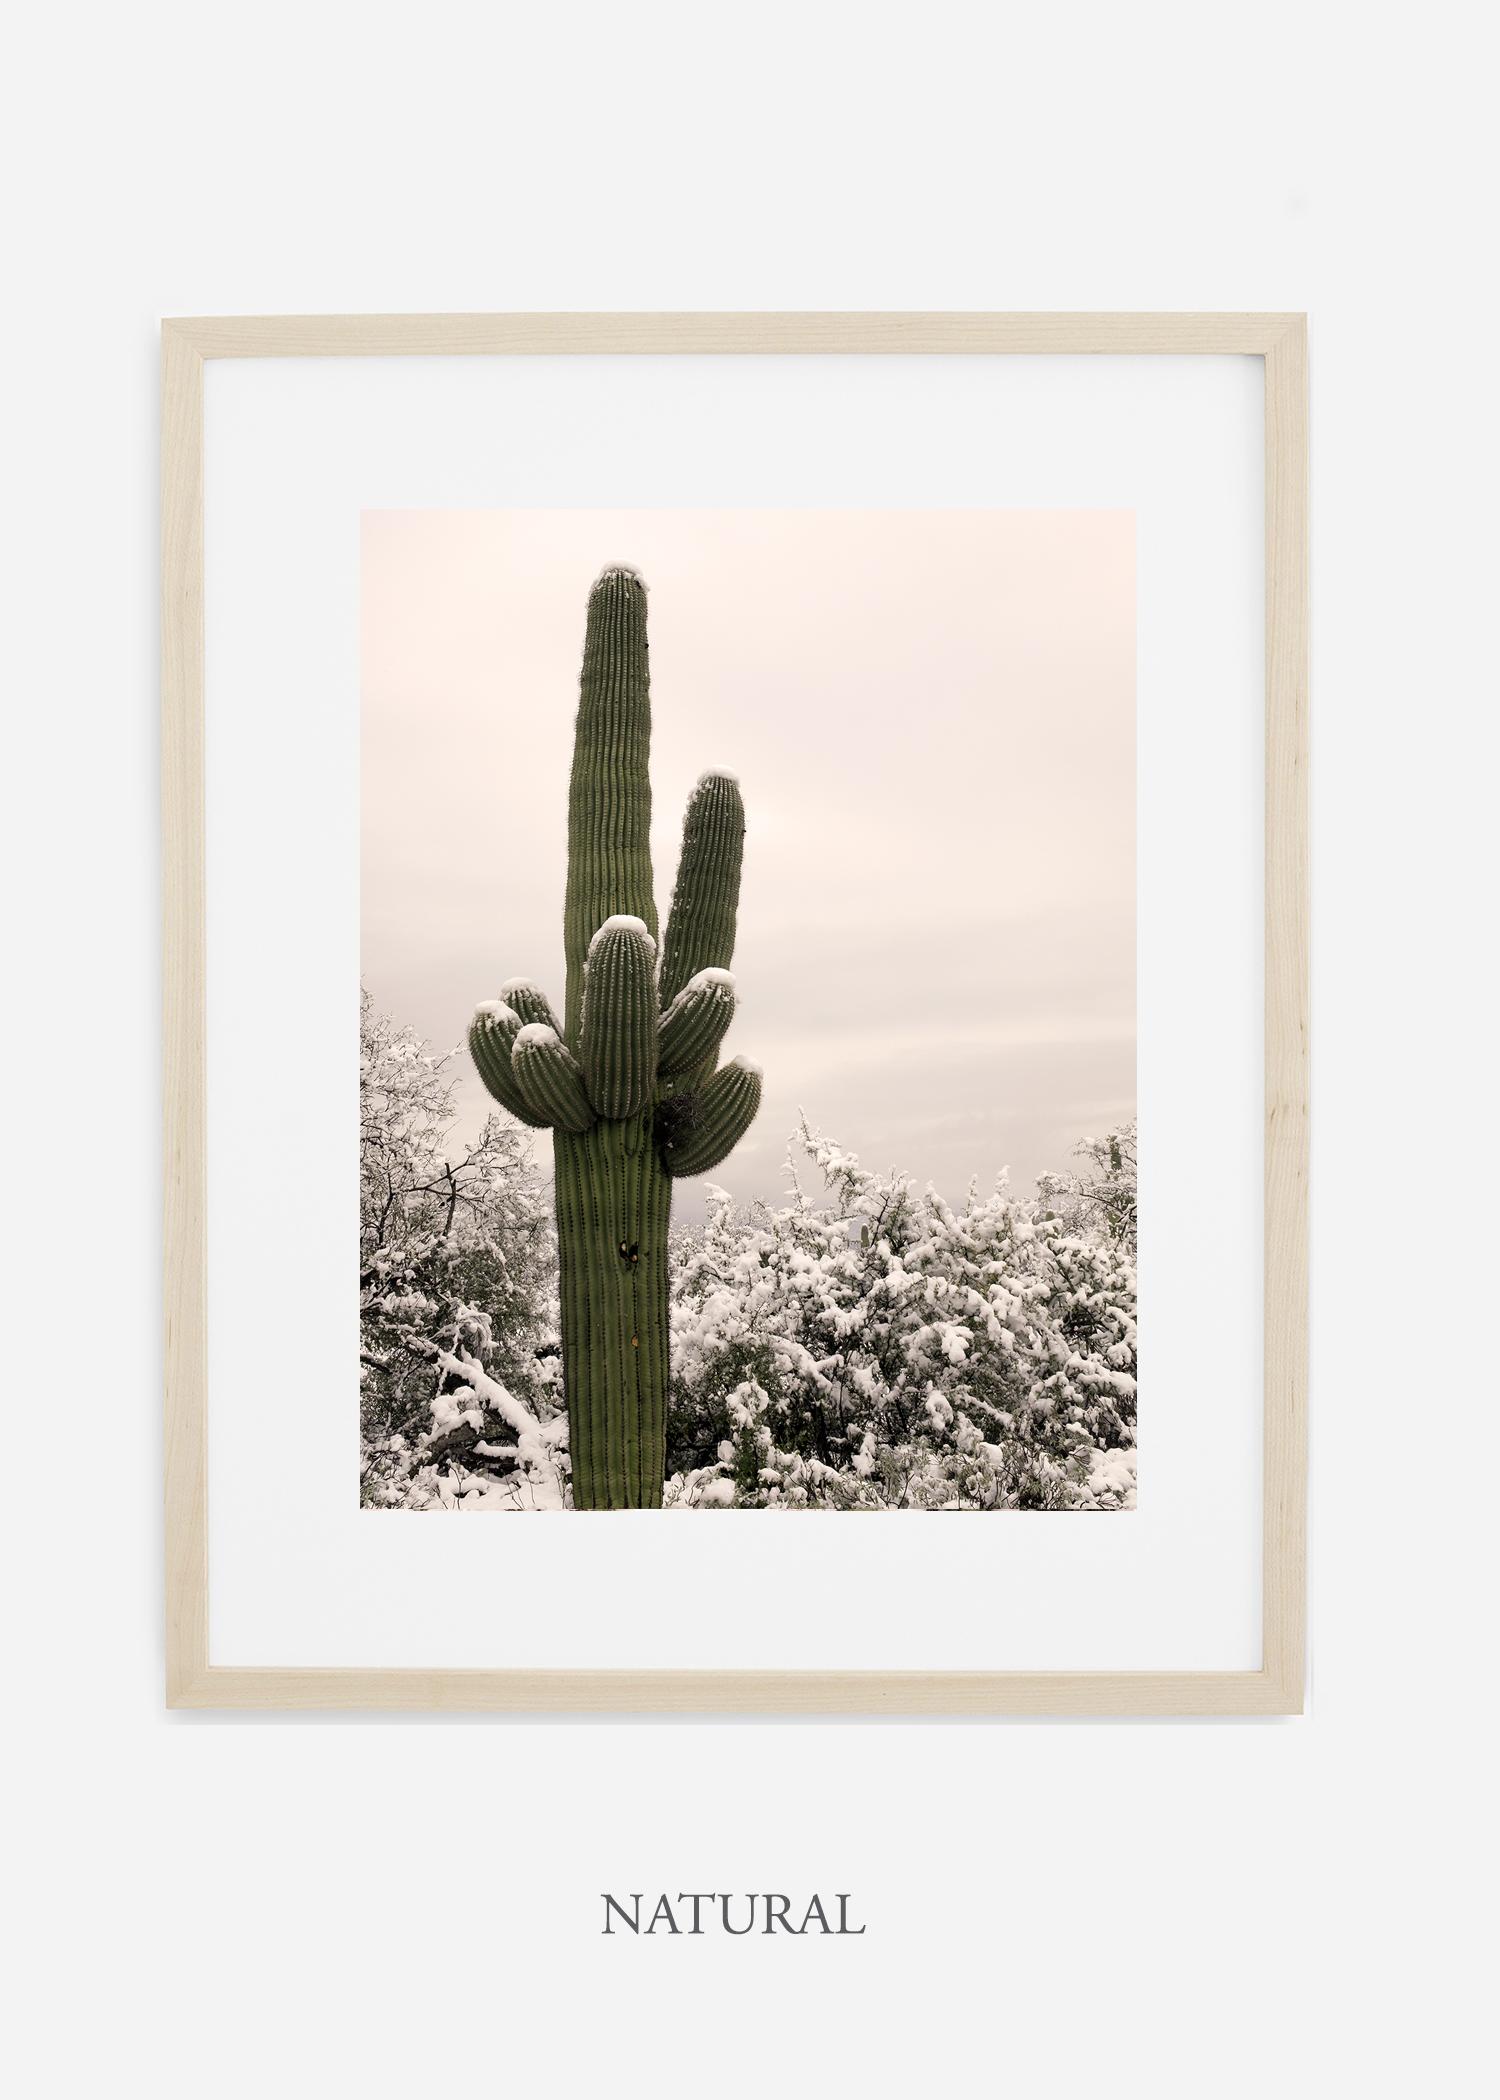 naturalframe-saguaroNo.6-wildercalifornia-art-wallart-cactusprint-homedecor-prints-arizona-botanical-artwork-interiordesign.jpg